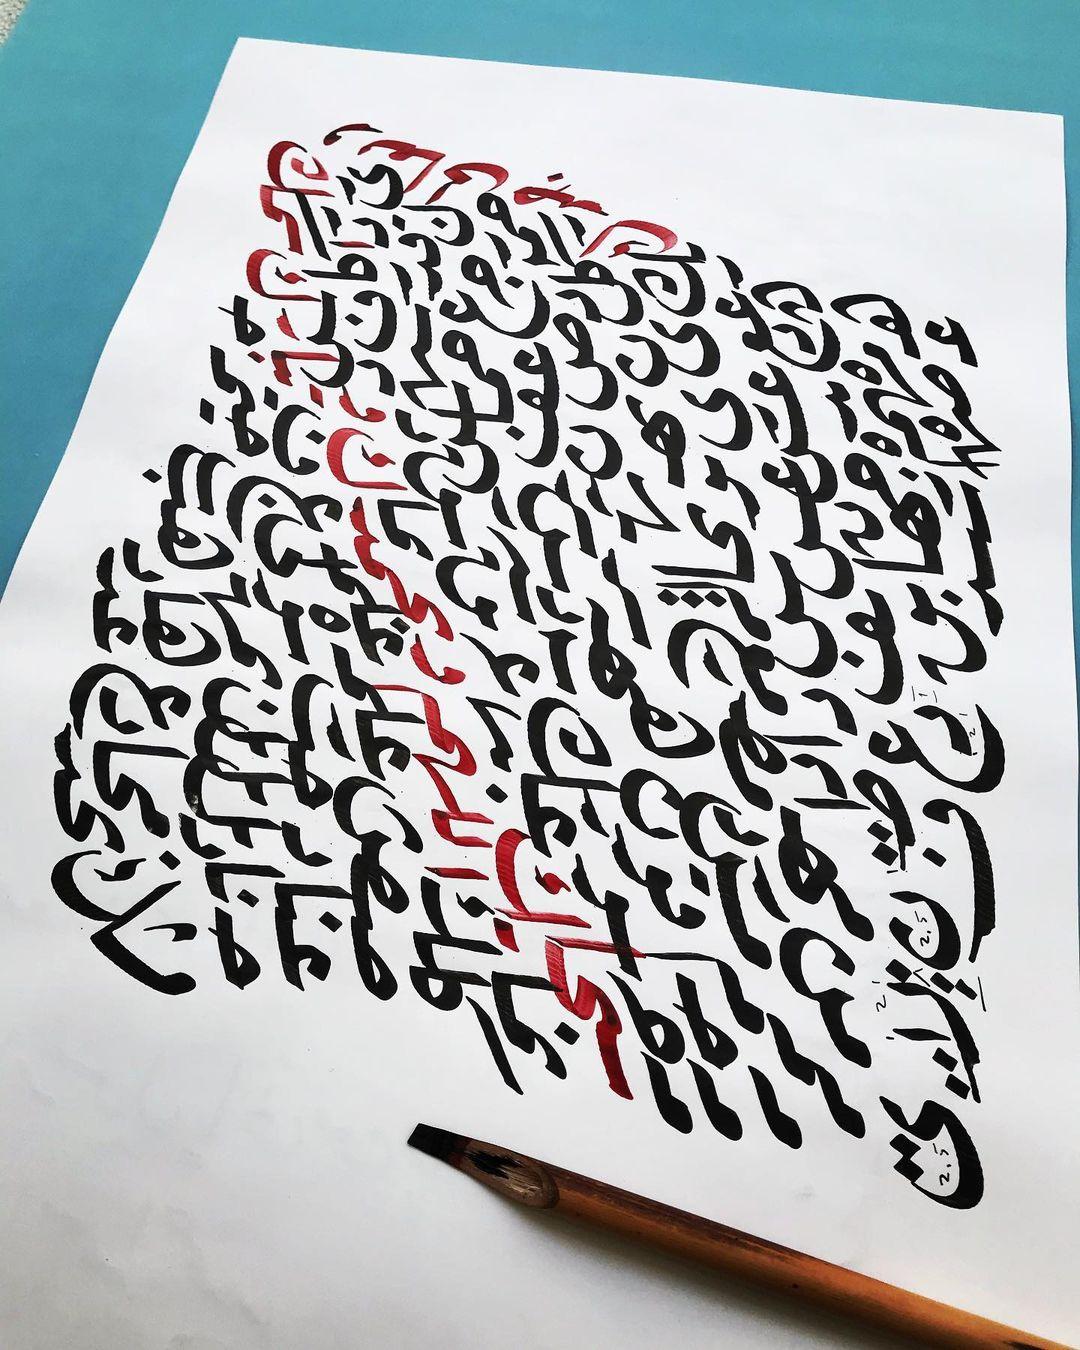 Donwload Photo Mashq #mashq #مشق #exercise #arabiccalligraphy #islamiccalligraphy #tezhip #hüs...- hattat_aa 2